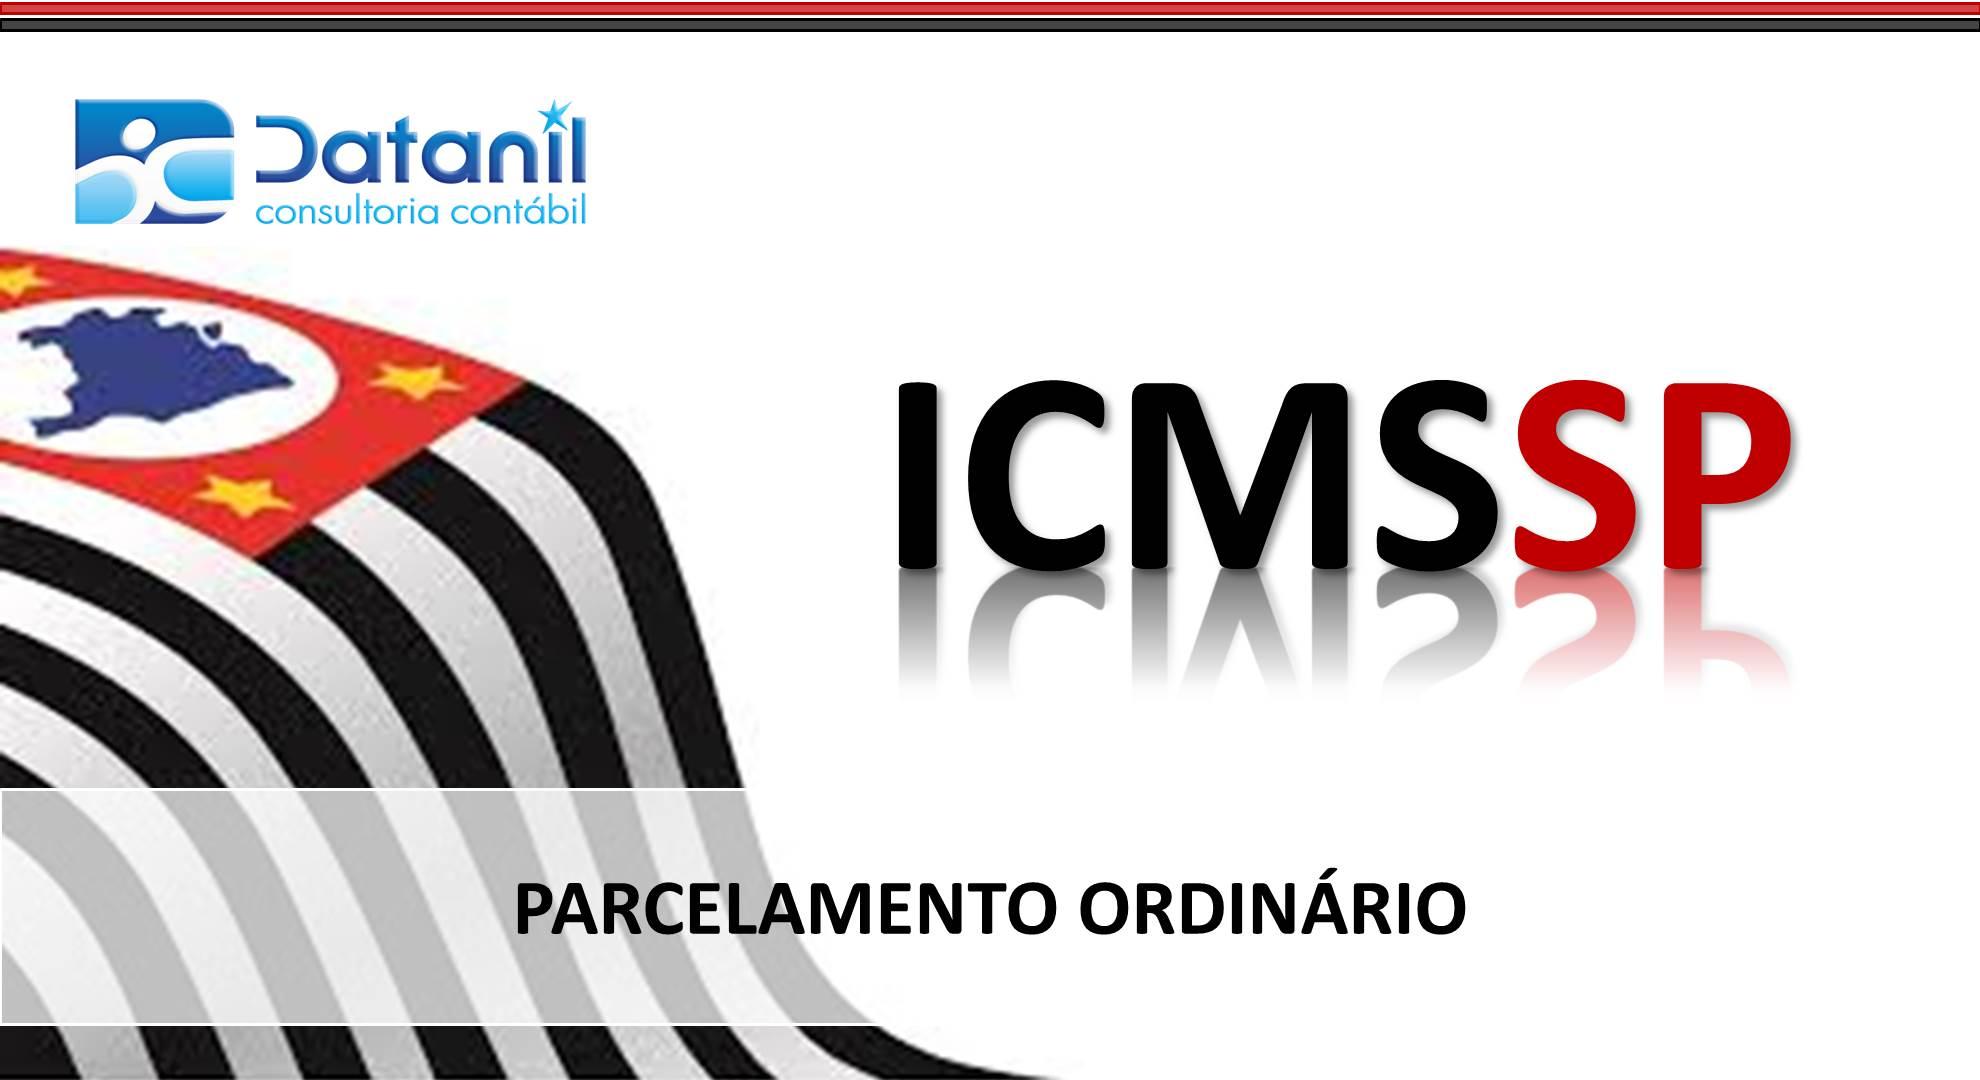 ICMS PARCELAMENTO ORDINARIO